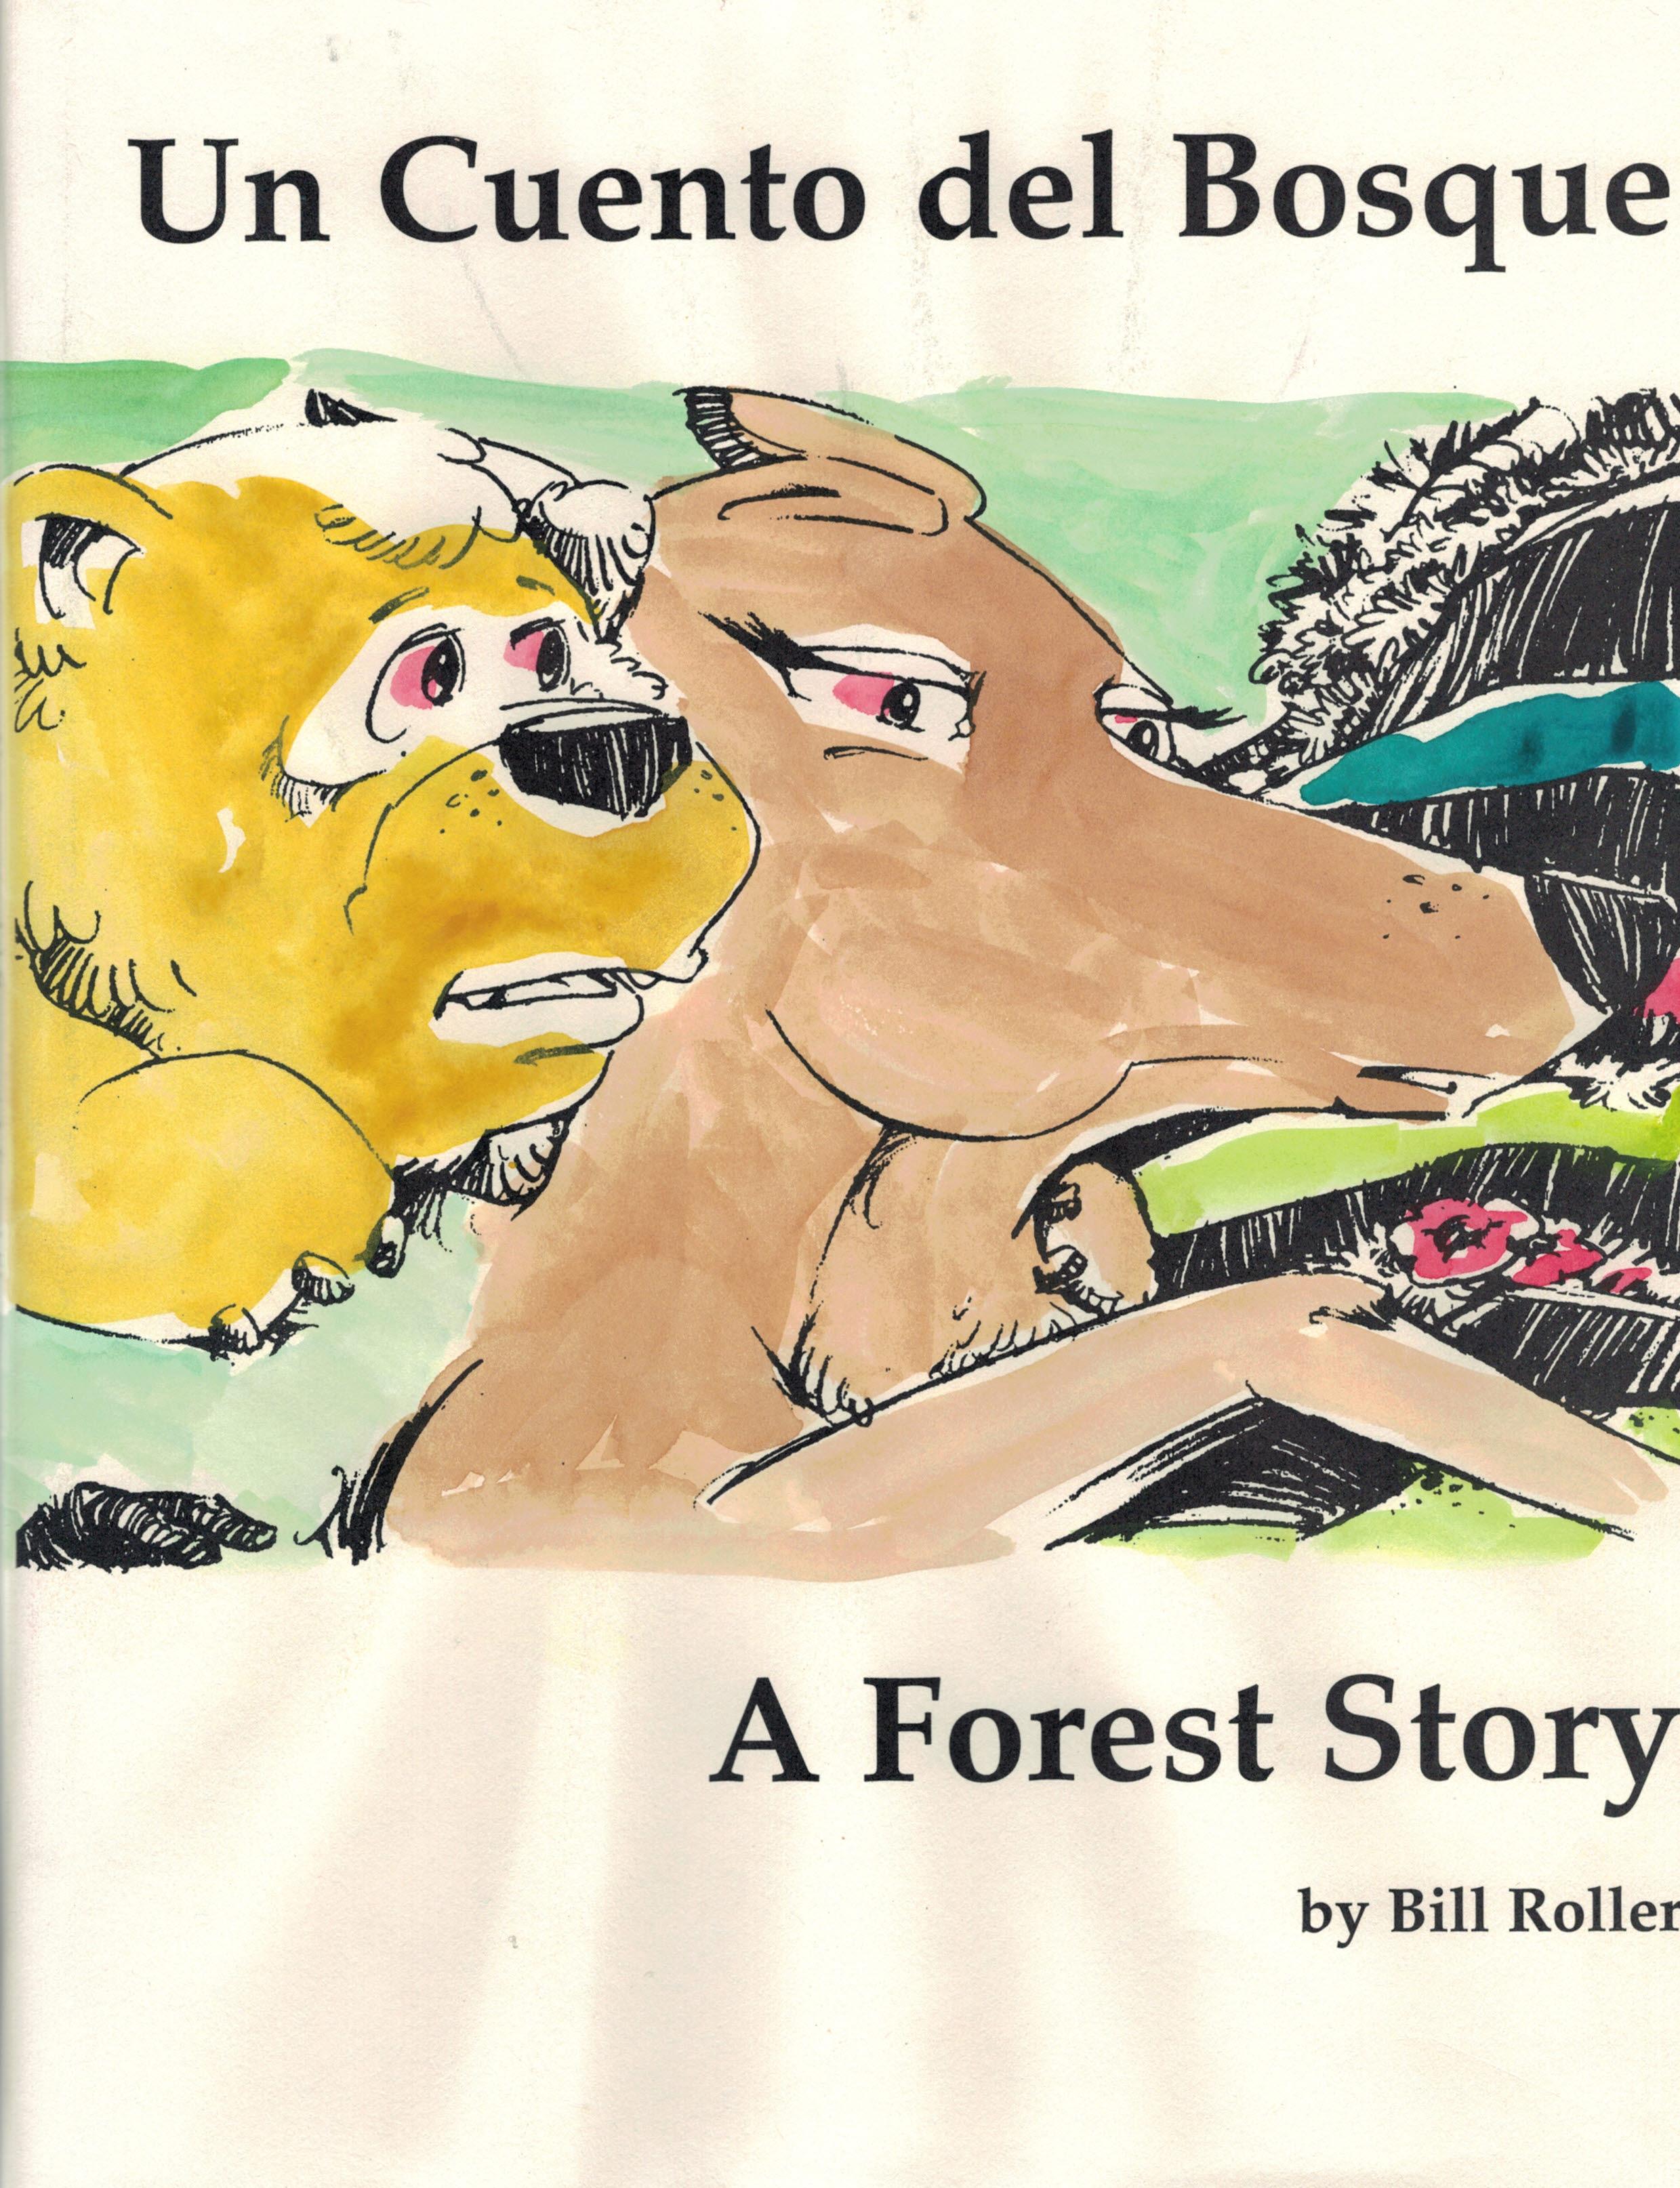 Un Cuento del Bosque: A Forest Story - A bilingual children's story with illustrationsBerkeley: Carpinchu Press, 1998